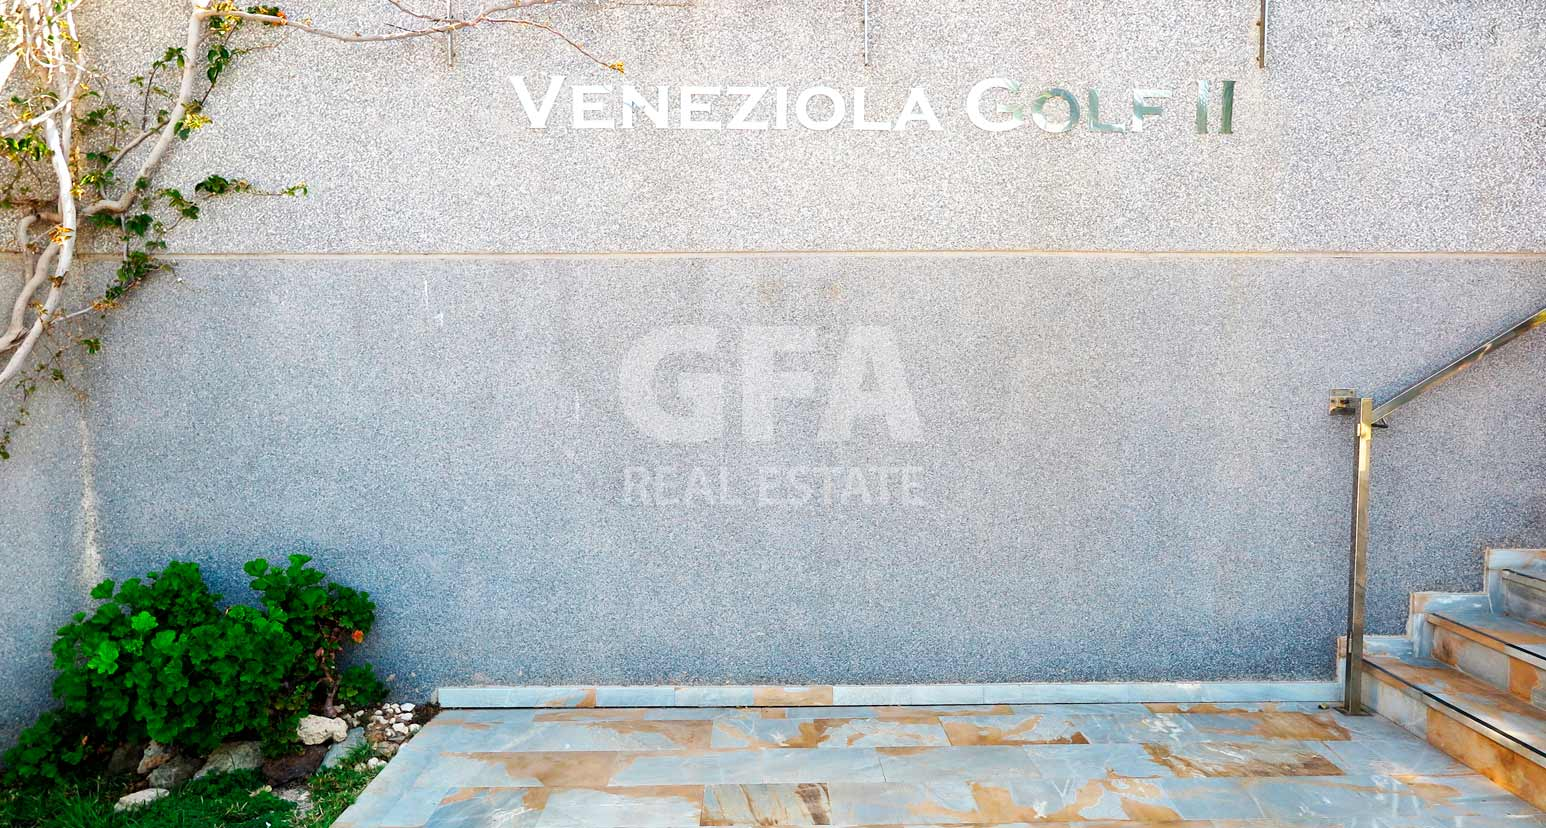 pisos-venta-la-manga-veneziola-entrada